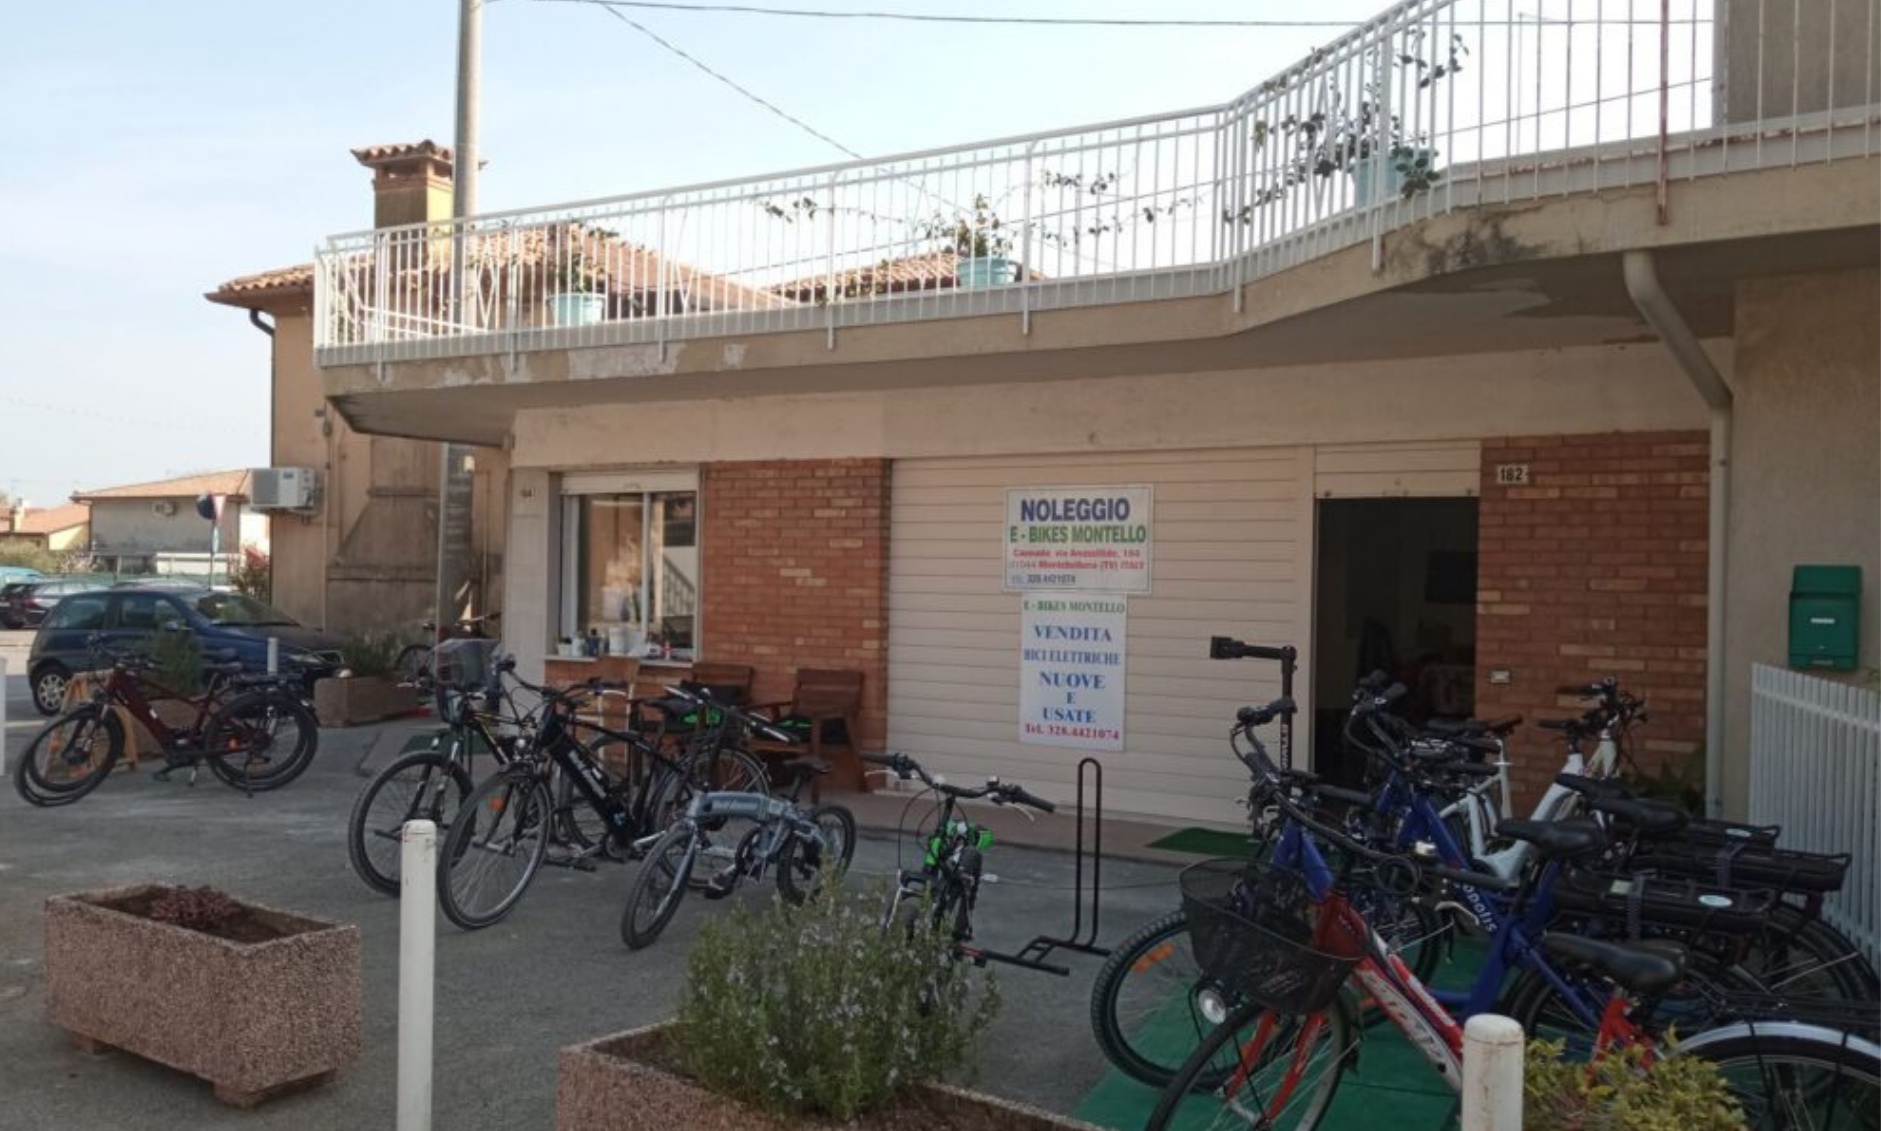 E-bikes-Montello_001